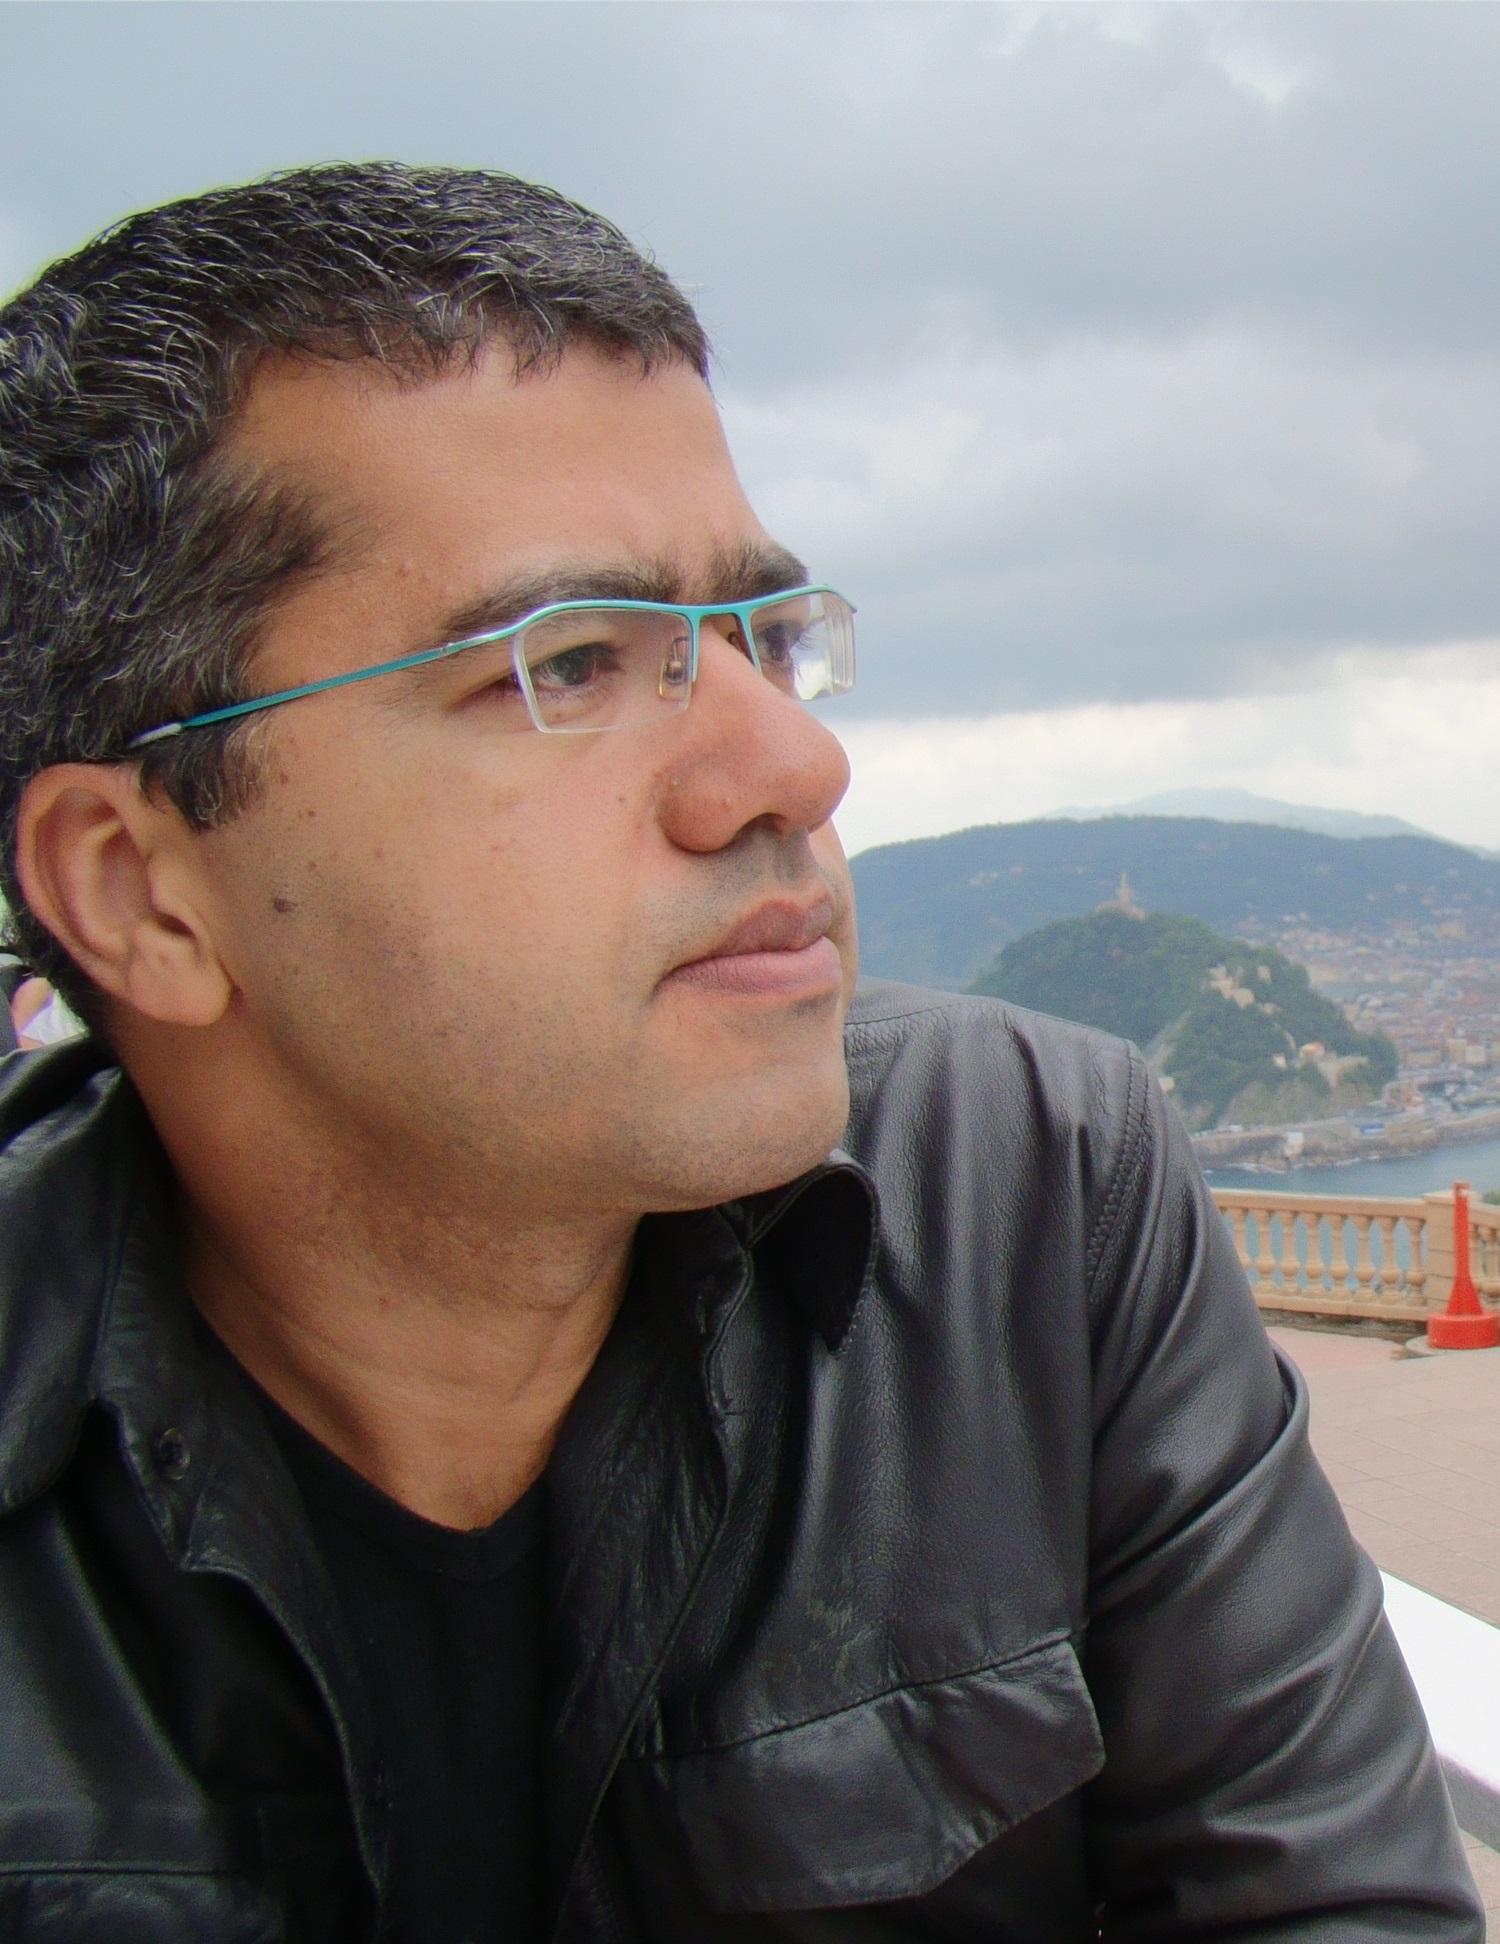 Jorge Lyra, coordenador do GT Genero e Saude da Abrasco.